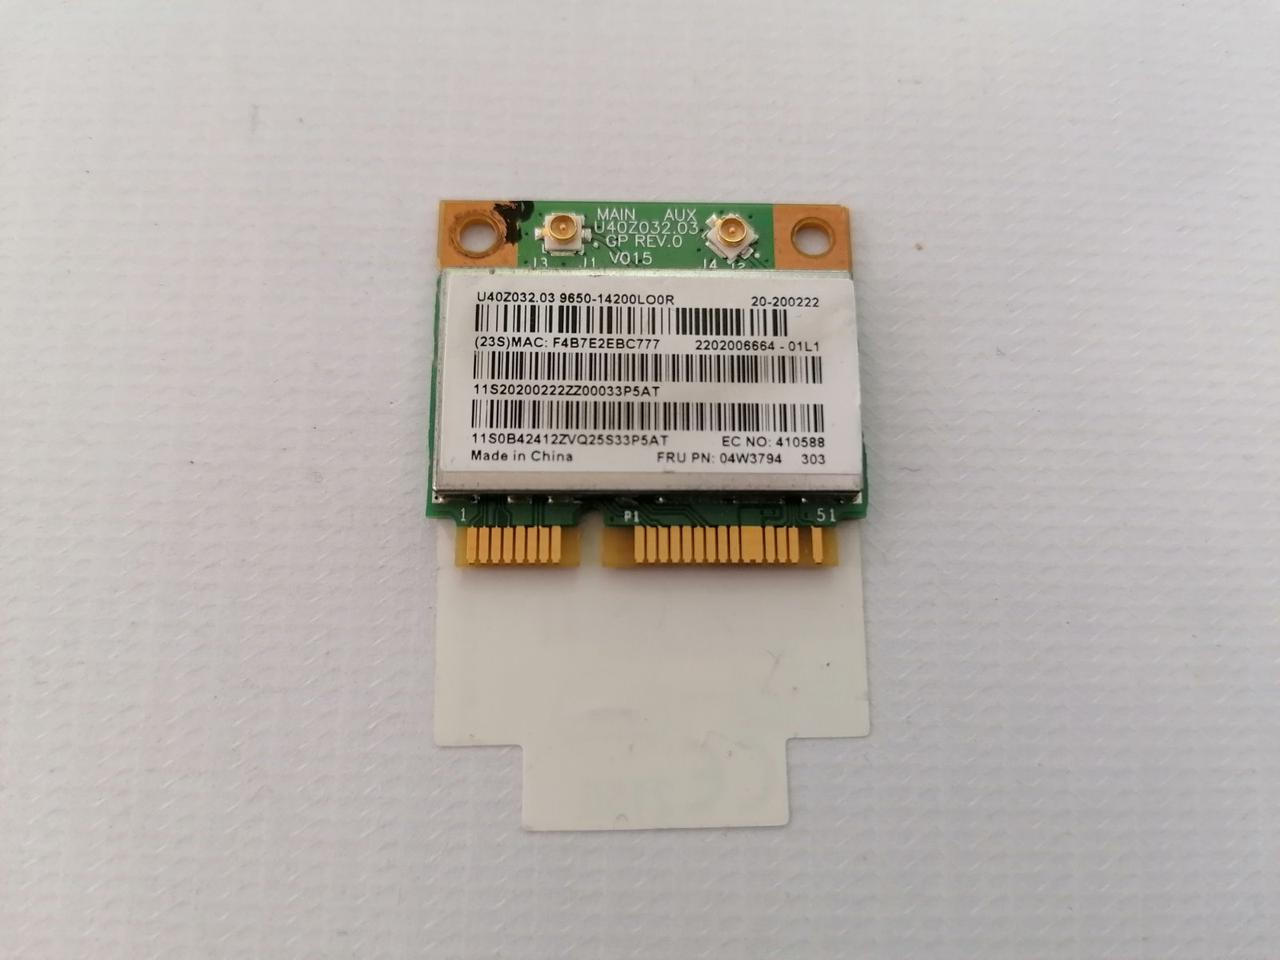 Б/У Wi-Fi+Bluetooth модуль 4.0 BCM943142HM Broadcom mini PCI-E от LENOVO